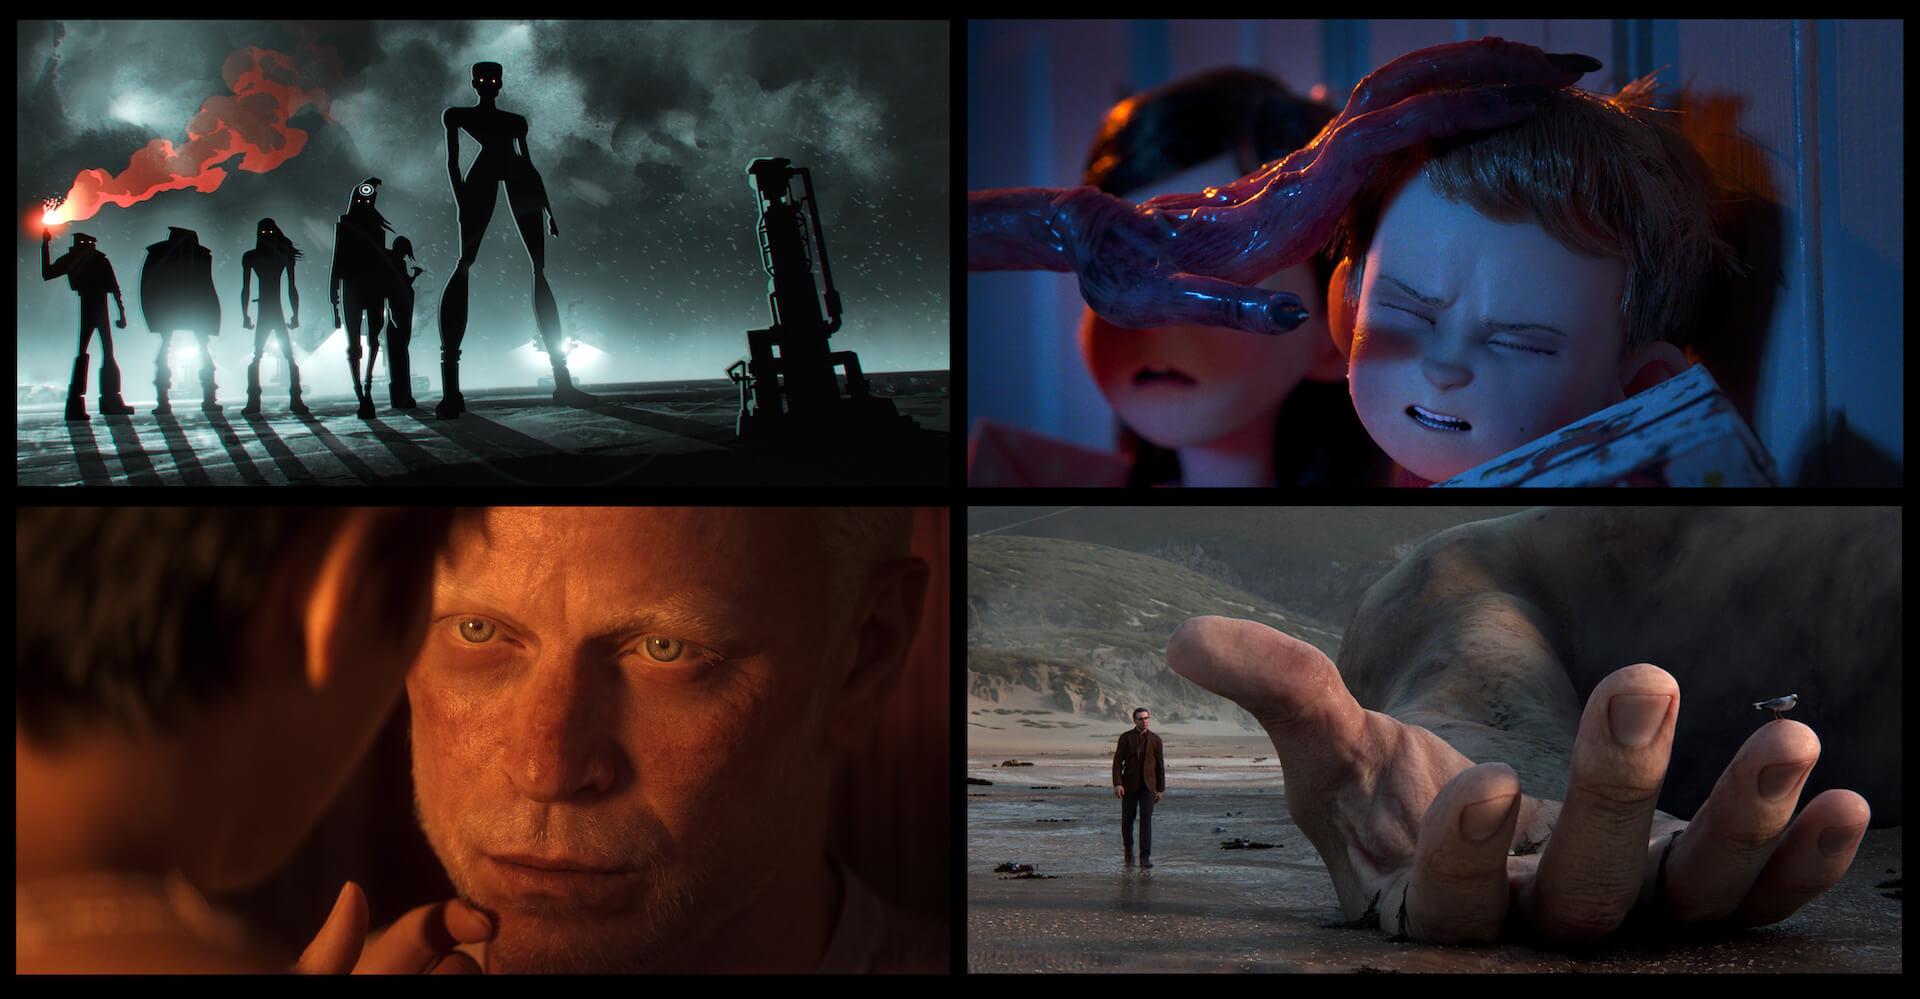 NetflixにMCU『スパイダーマン』が登場!『ファースト・マン』『マスカレード・ホテル』など5月のラインナップが一挙解禁 art210423_netflix_may_4